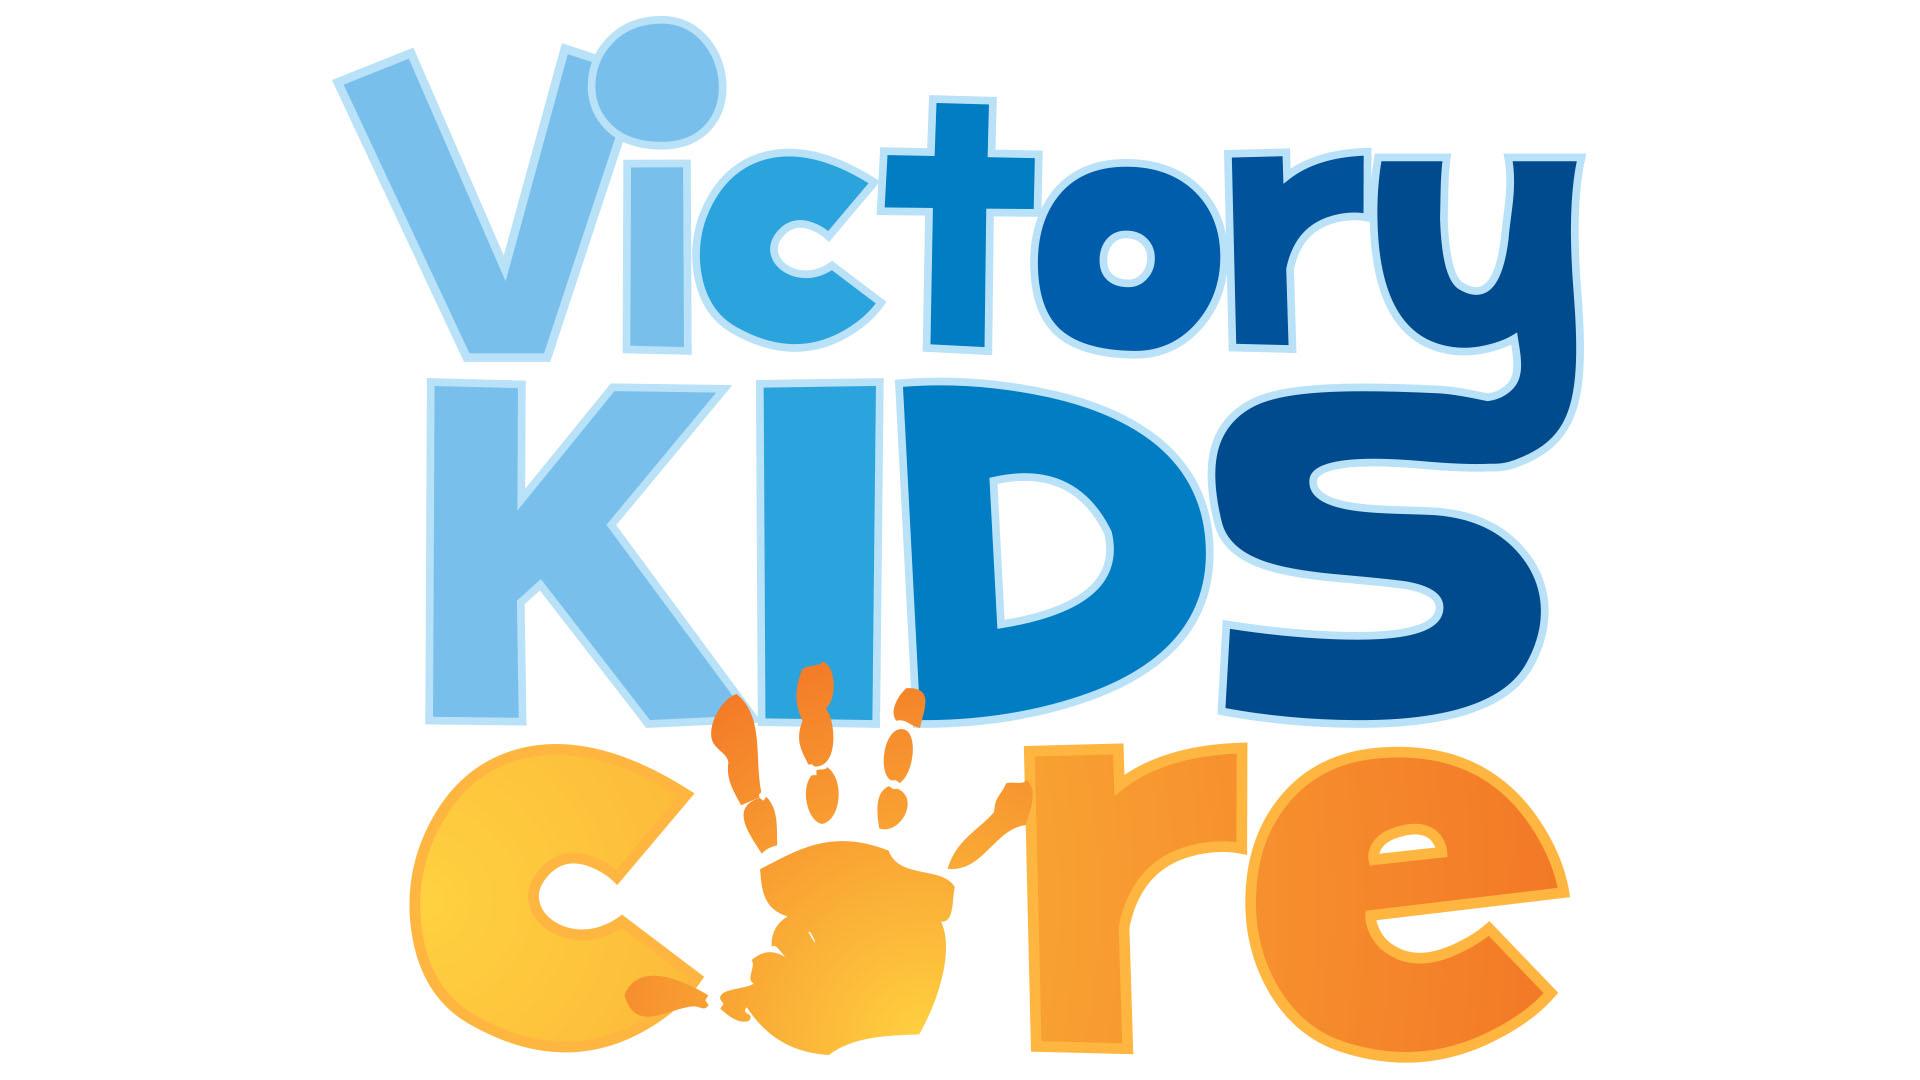 Victory kids care 1920x1080